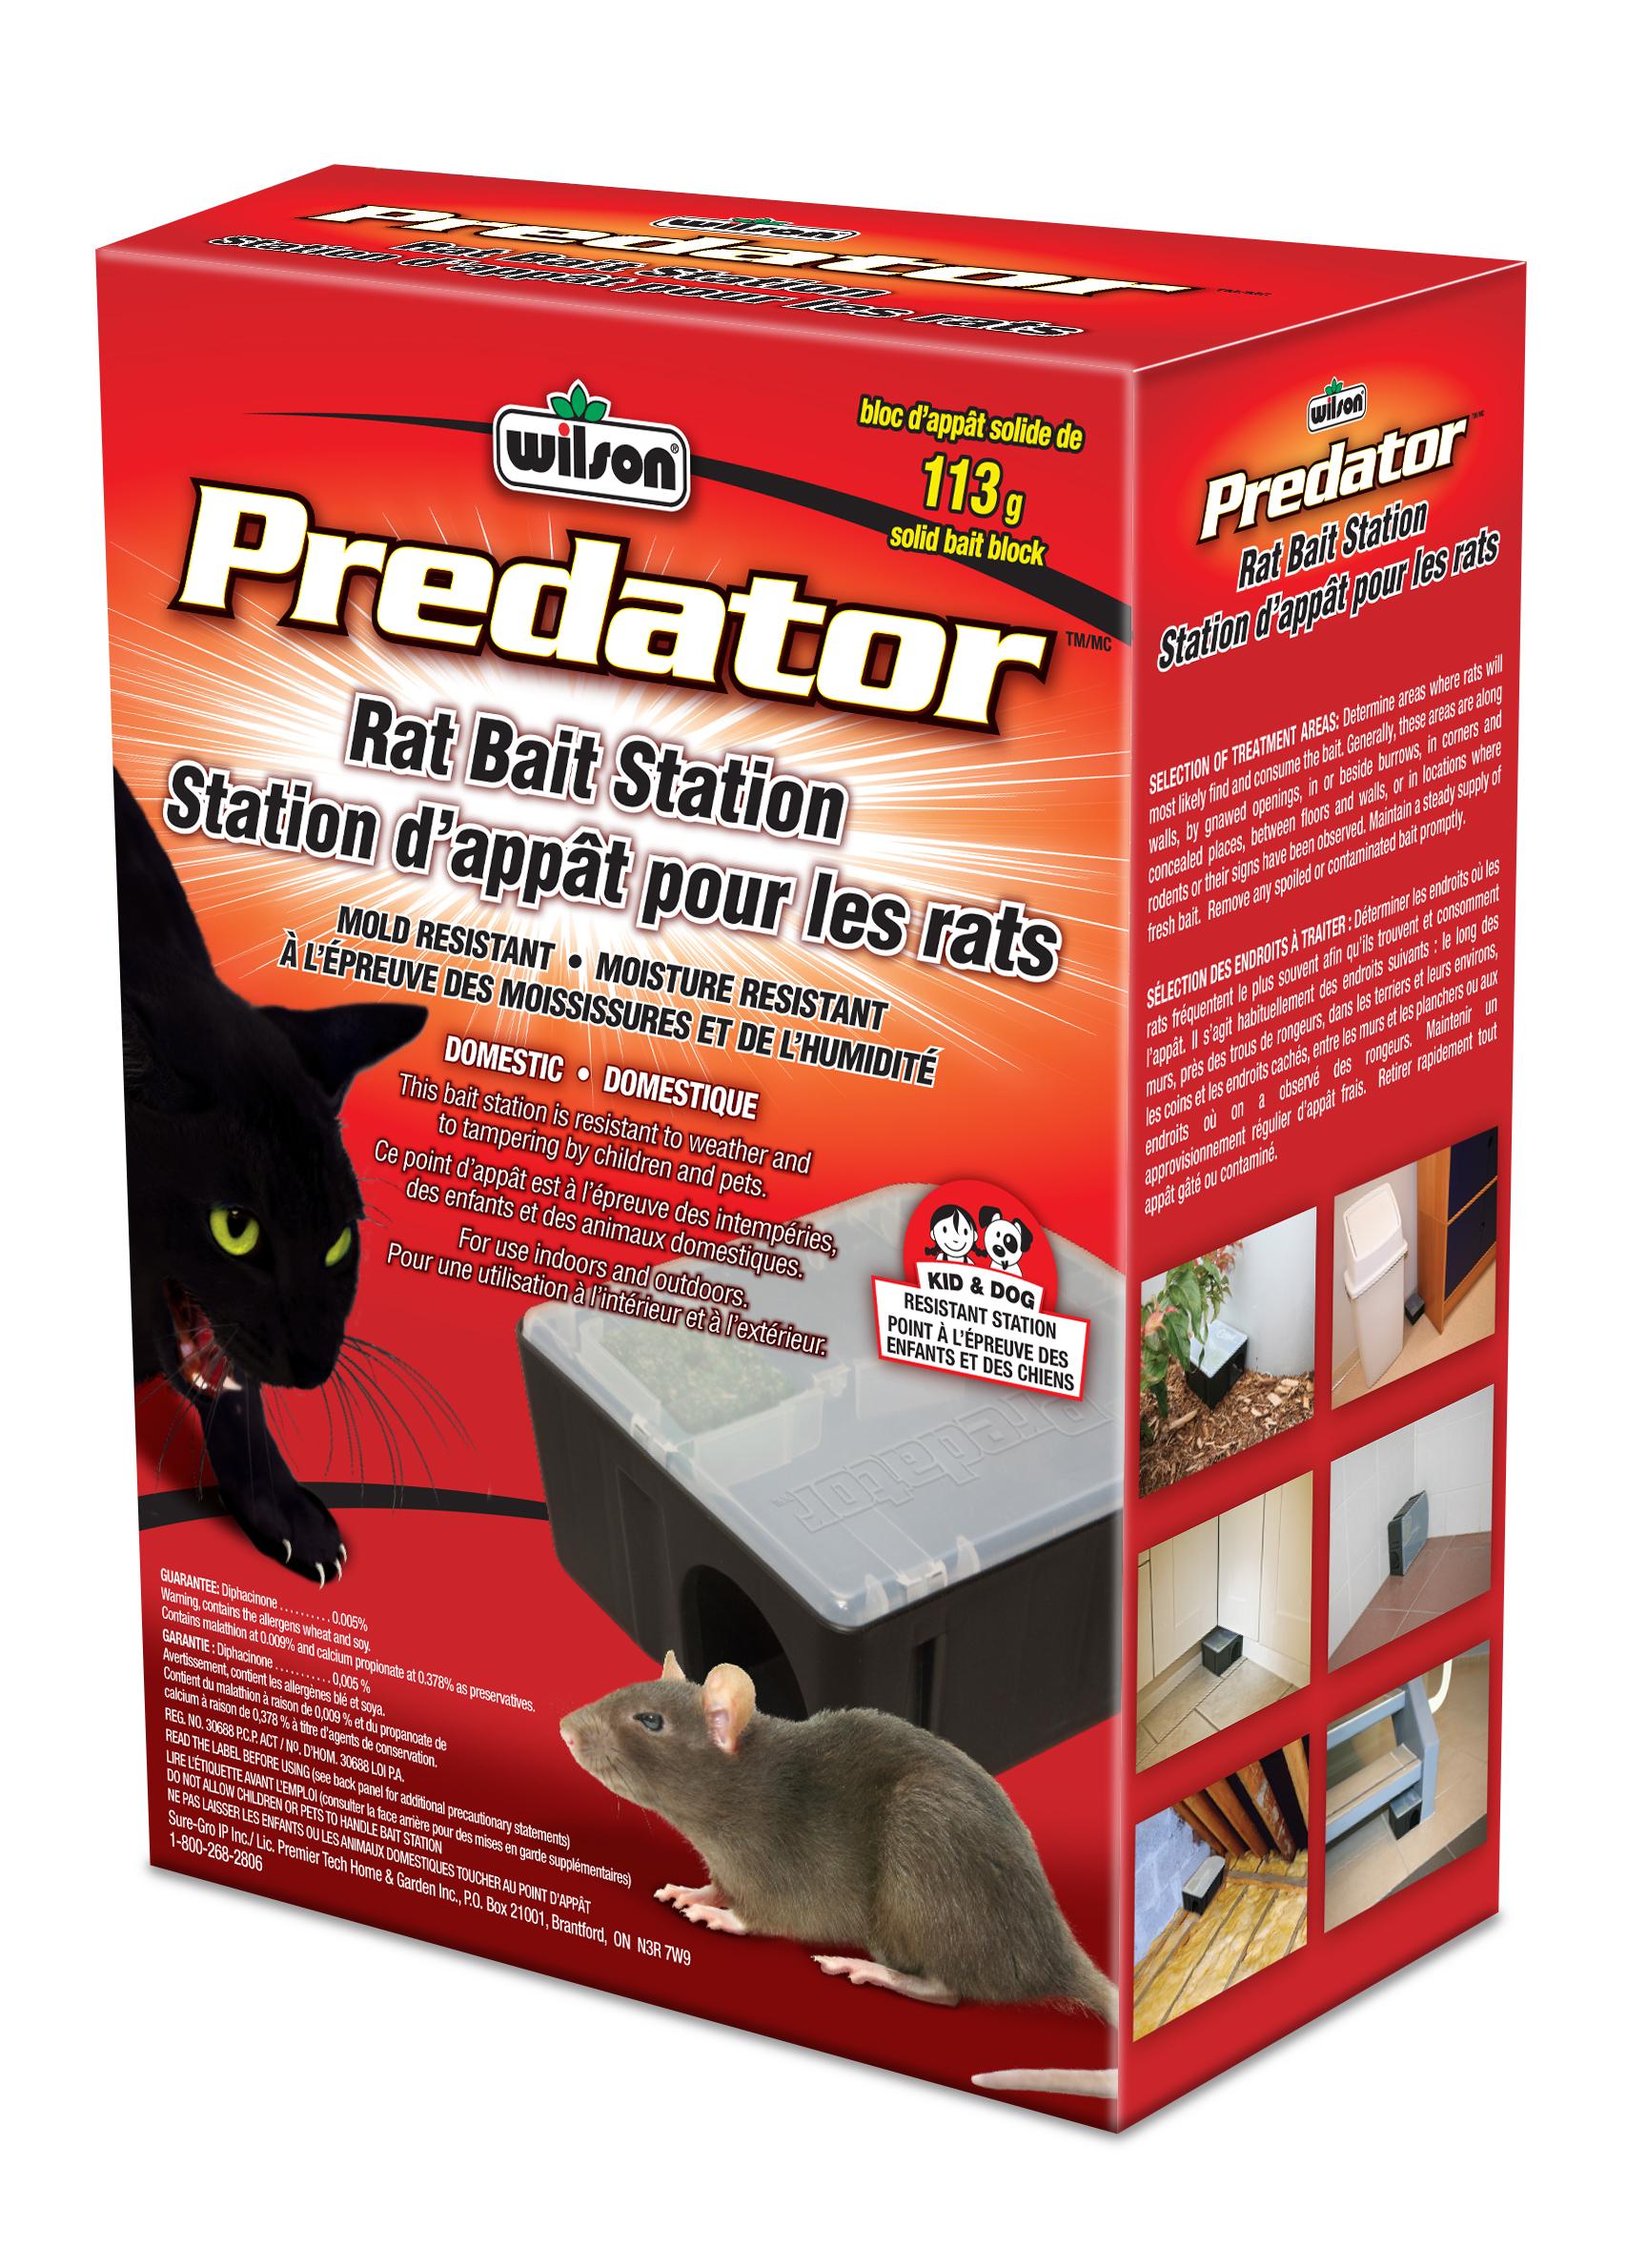 7740050 Wilson Predator Rat Bait Station Hi Res